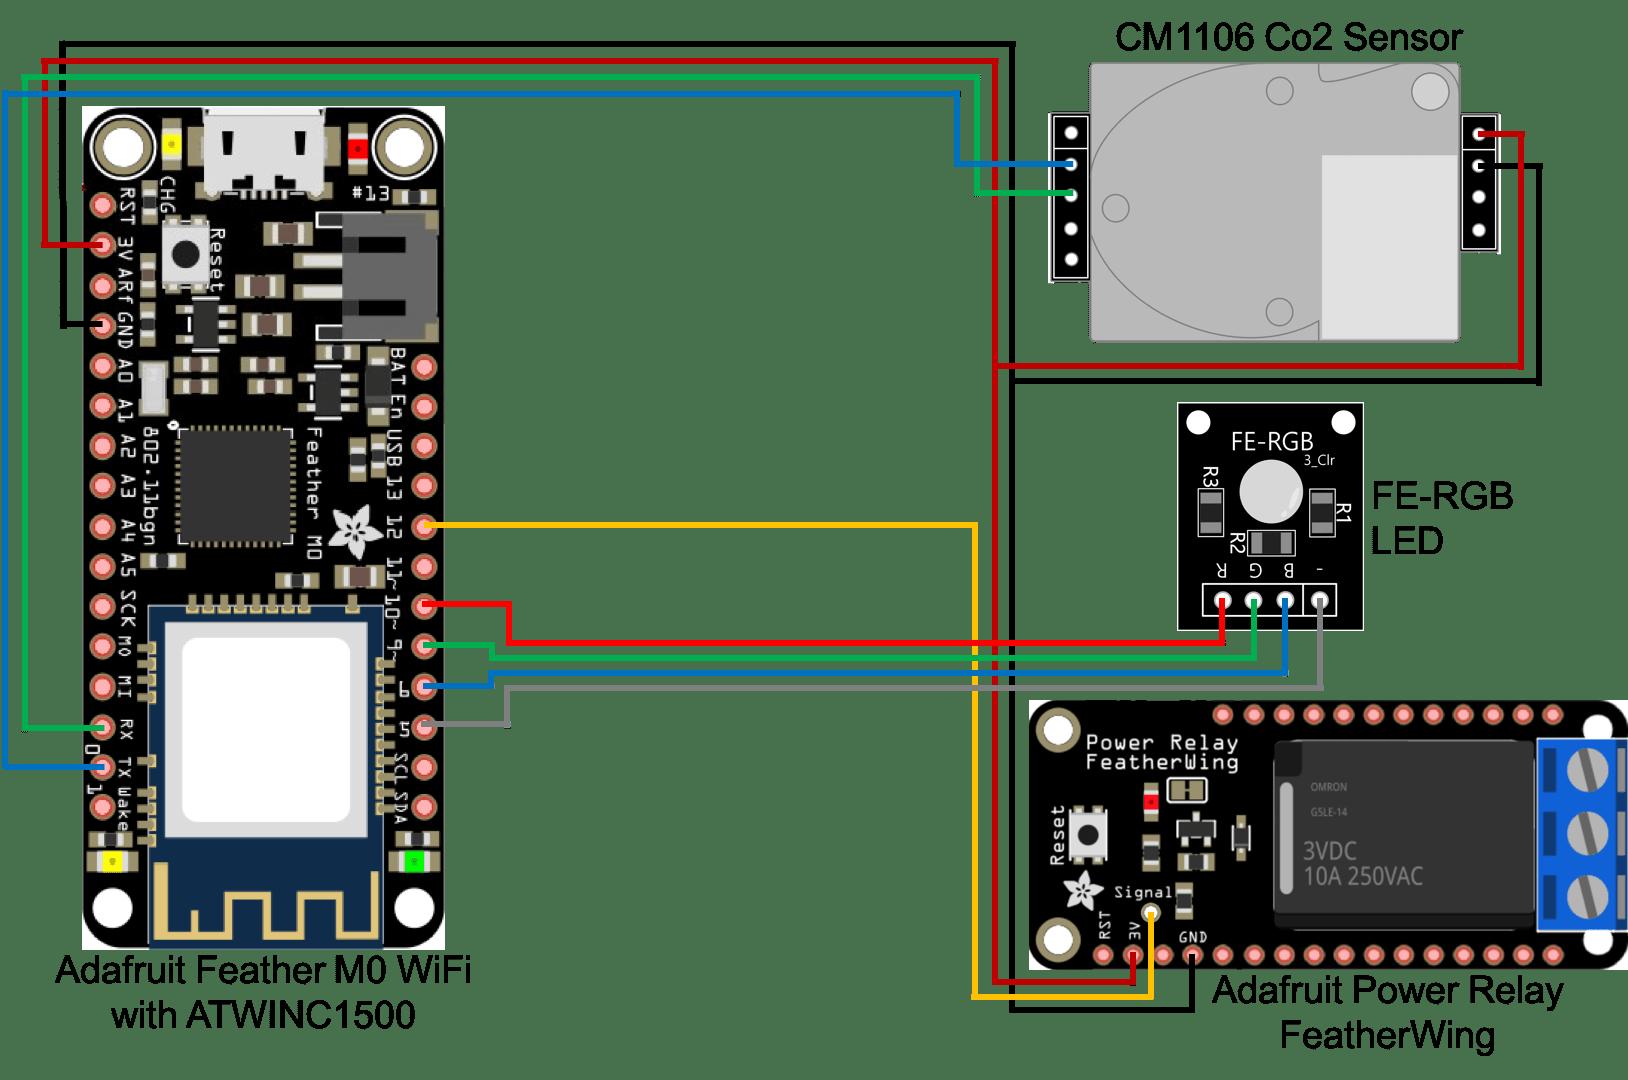 hight resolution of hardware composition adafuit feather m0 cm1106 co2 sensor